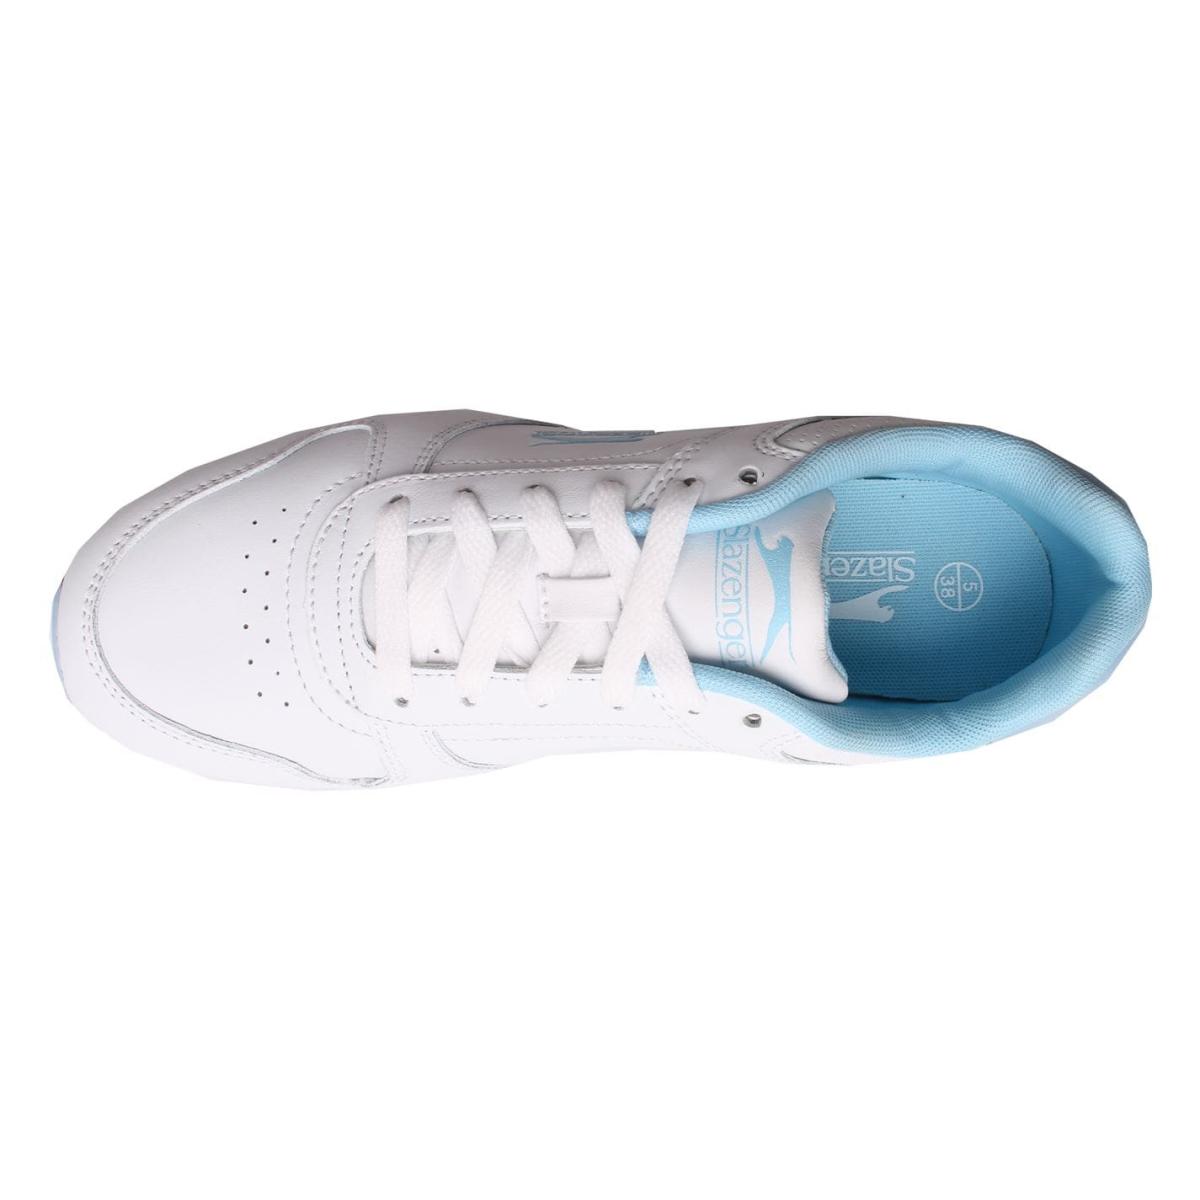 Slazenger-Classic-Turnschuhe-Laufschuhe-Damen-Sportschuhe-Sneaker-1265 Indexbild 20